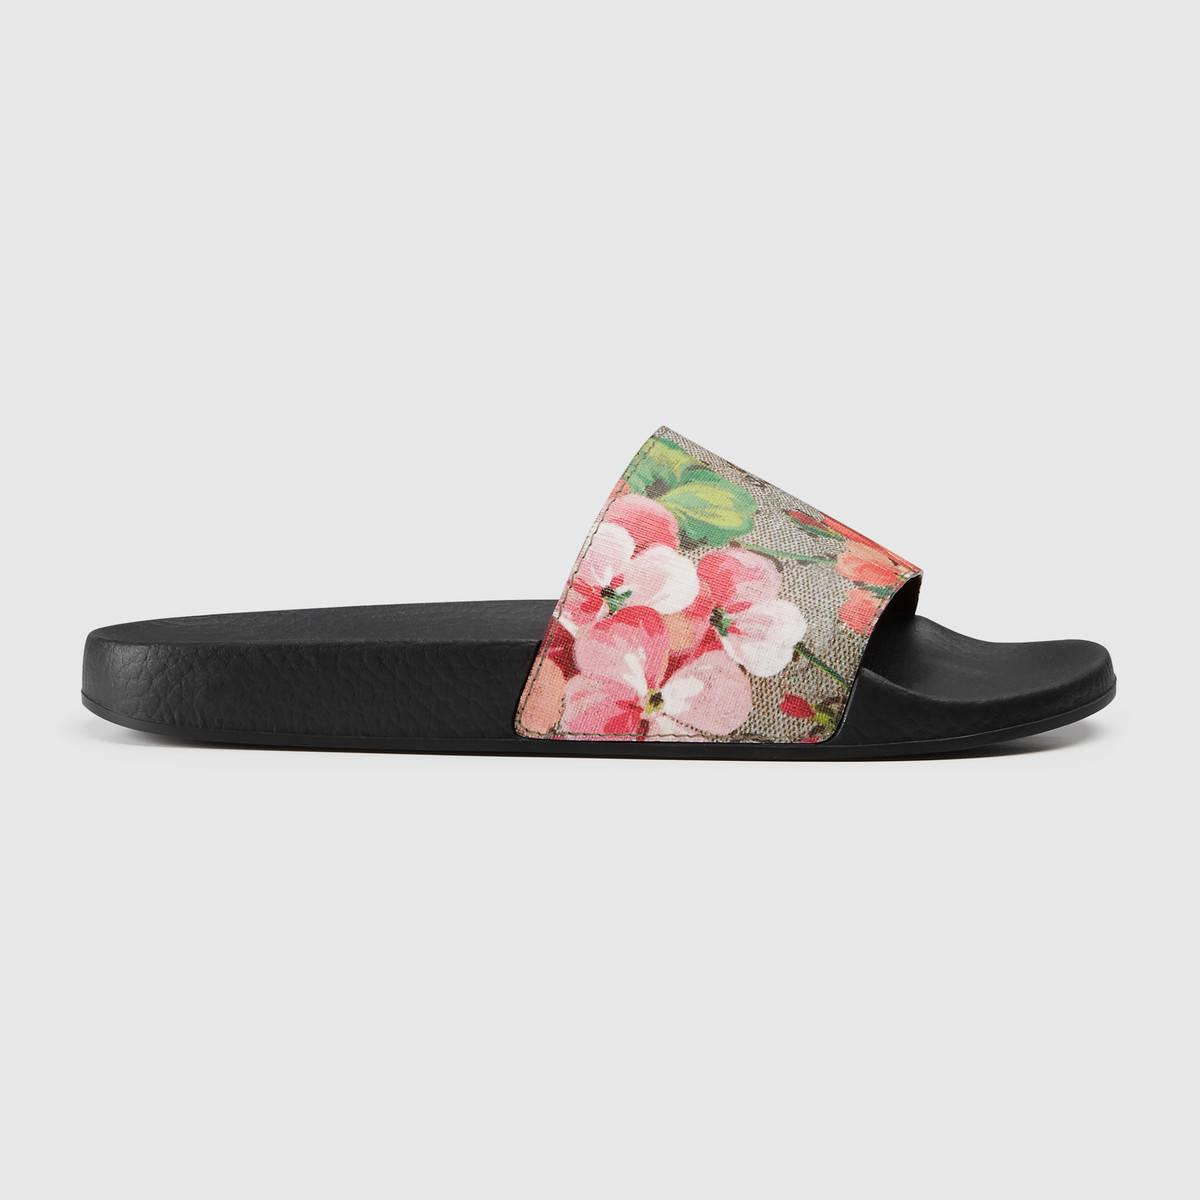 63c2fe174ce8 Fashion Designer Rubber Slide Sandal Floral Brocade Women Striped Beach  Causal Slipper Men Slipper Gear Bottoms Flip Flops With Box US5 11 Womens  Slippers ...